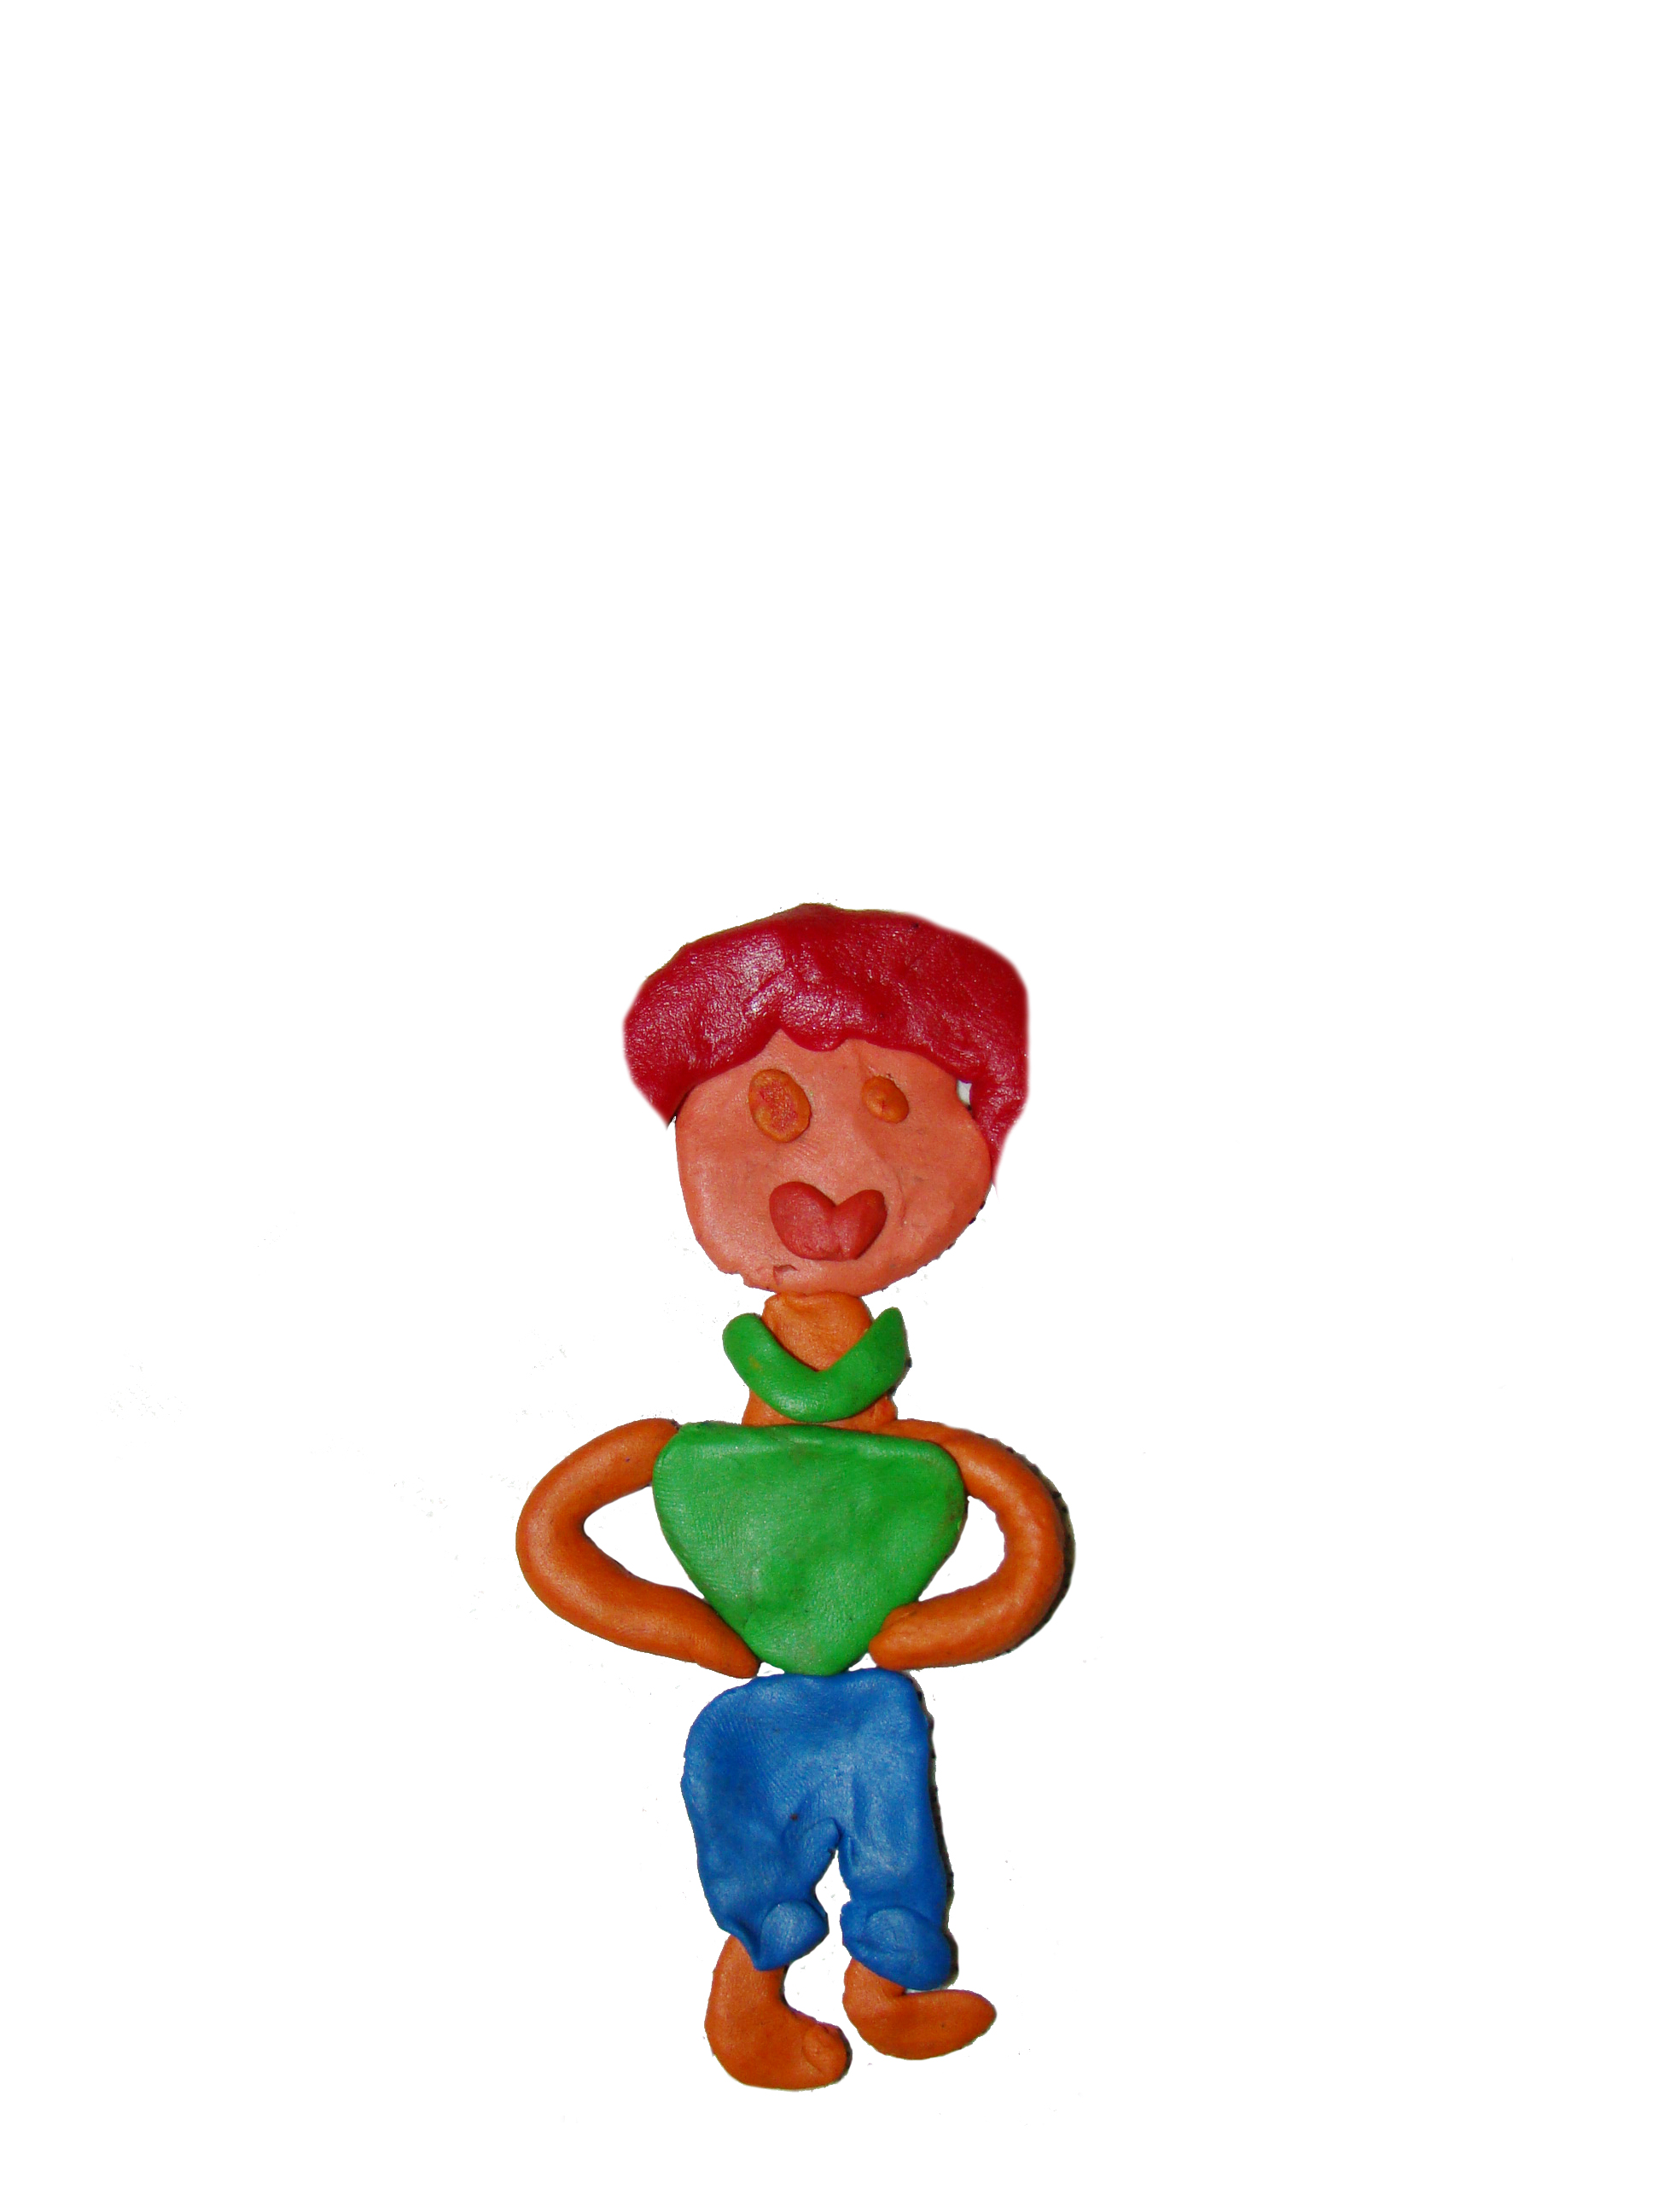 Playdough clipart boy. Free cliparts download clip